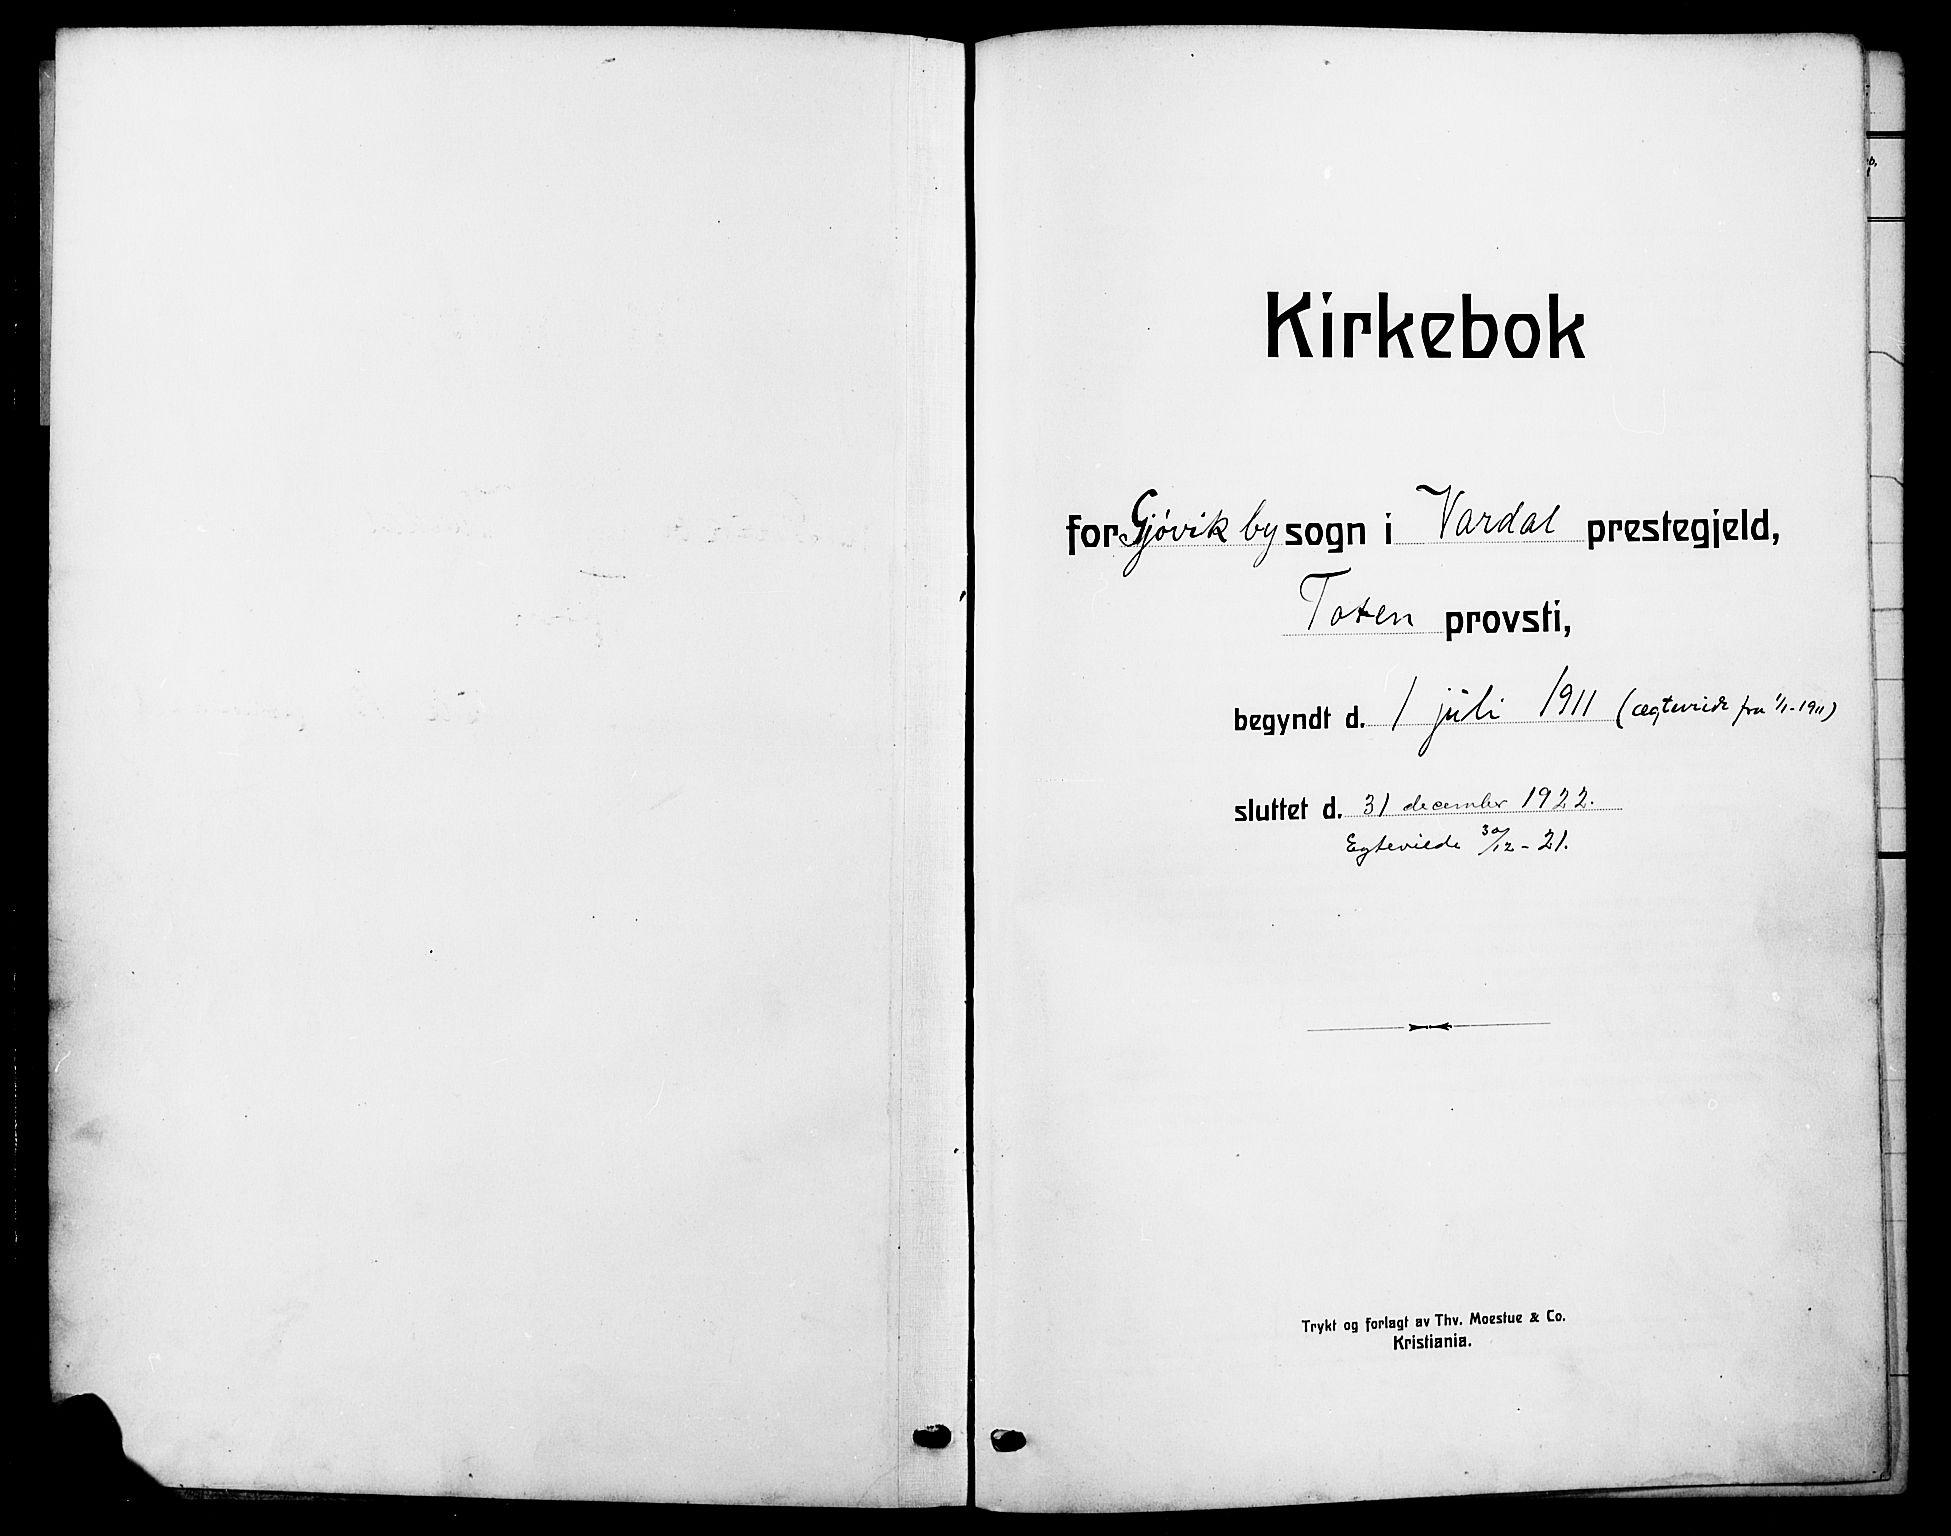 SAH, Vardal prestekontor, H/Ha/Hab/L0014: Klokkerbok nr. 14, 1911-1922